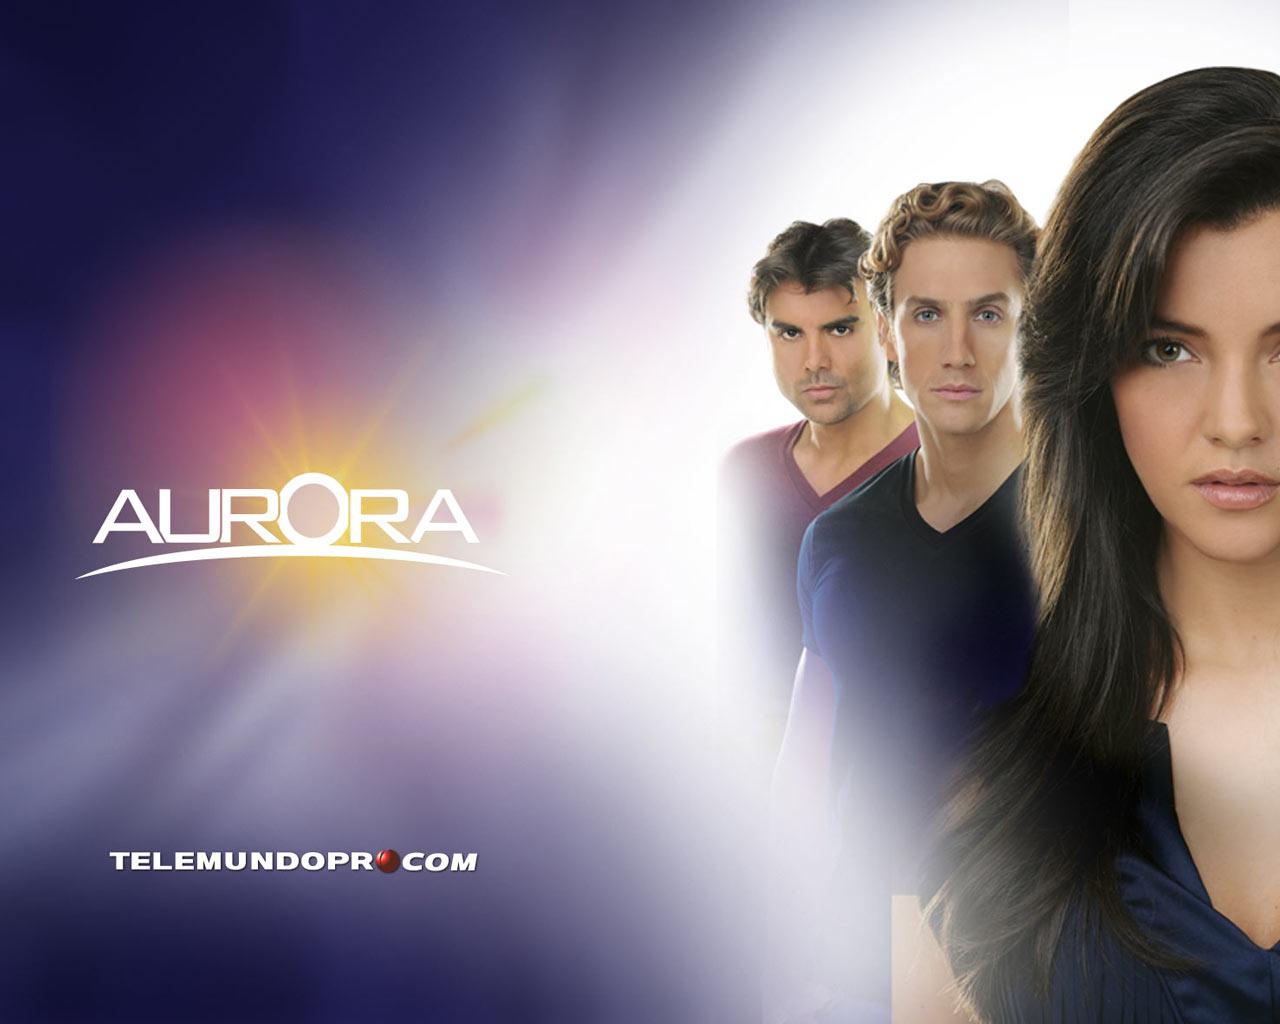 http://4.bp.blogspot.com/-WYEKFlO05Tg/TzuflhlE9CI/AAAAAAAABms/kcdwKJfNyW4/s1600/Aurora2_telenovela-kingdom.jpg